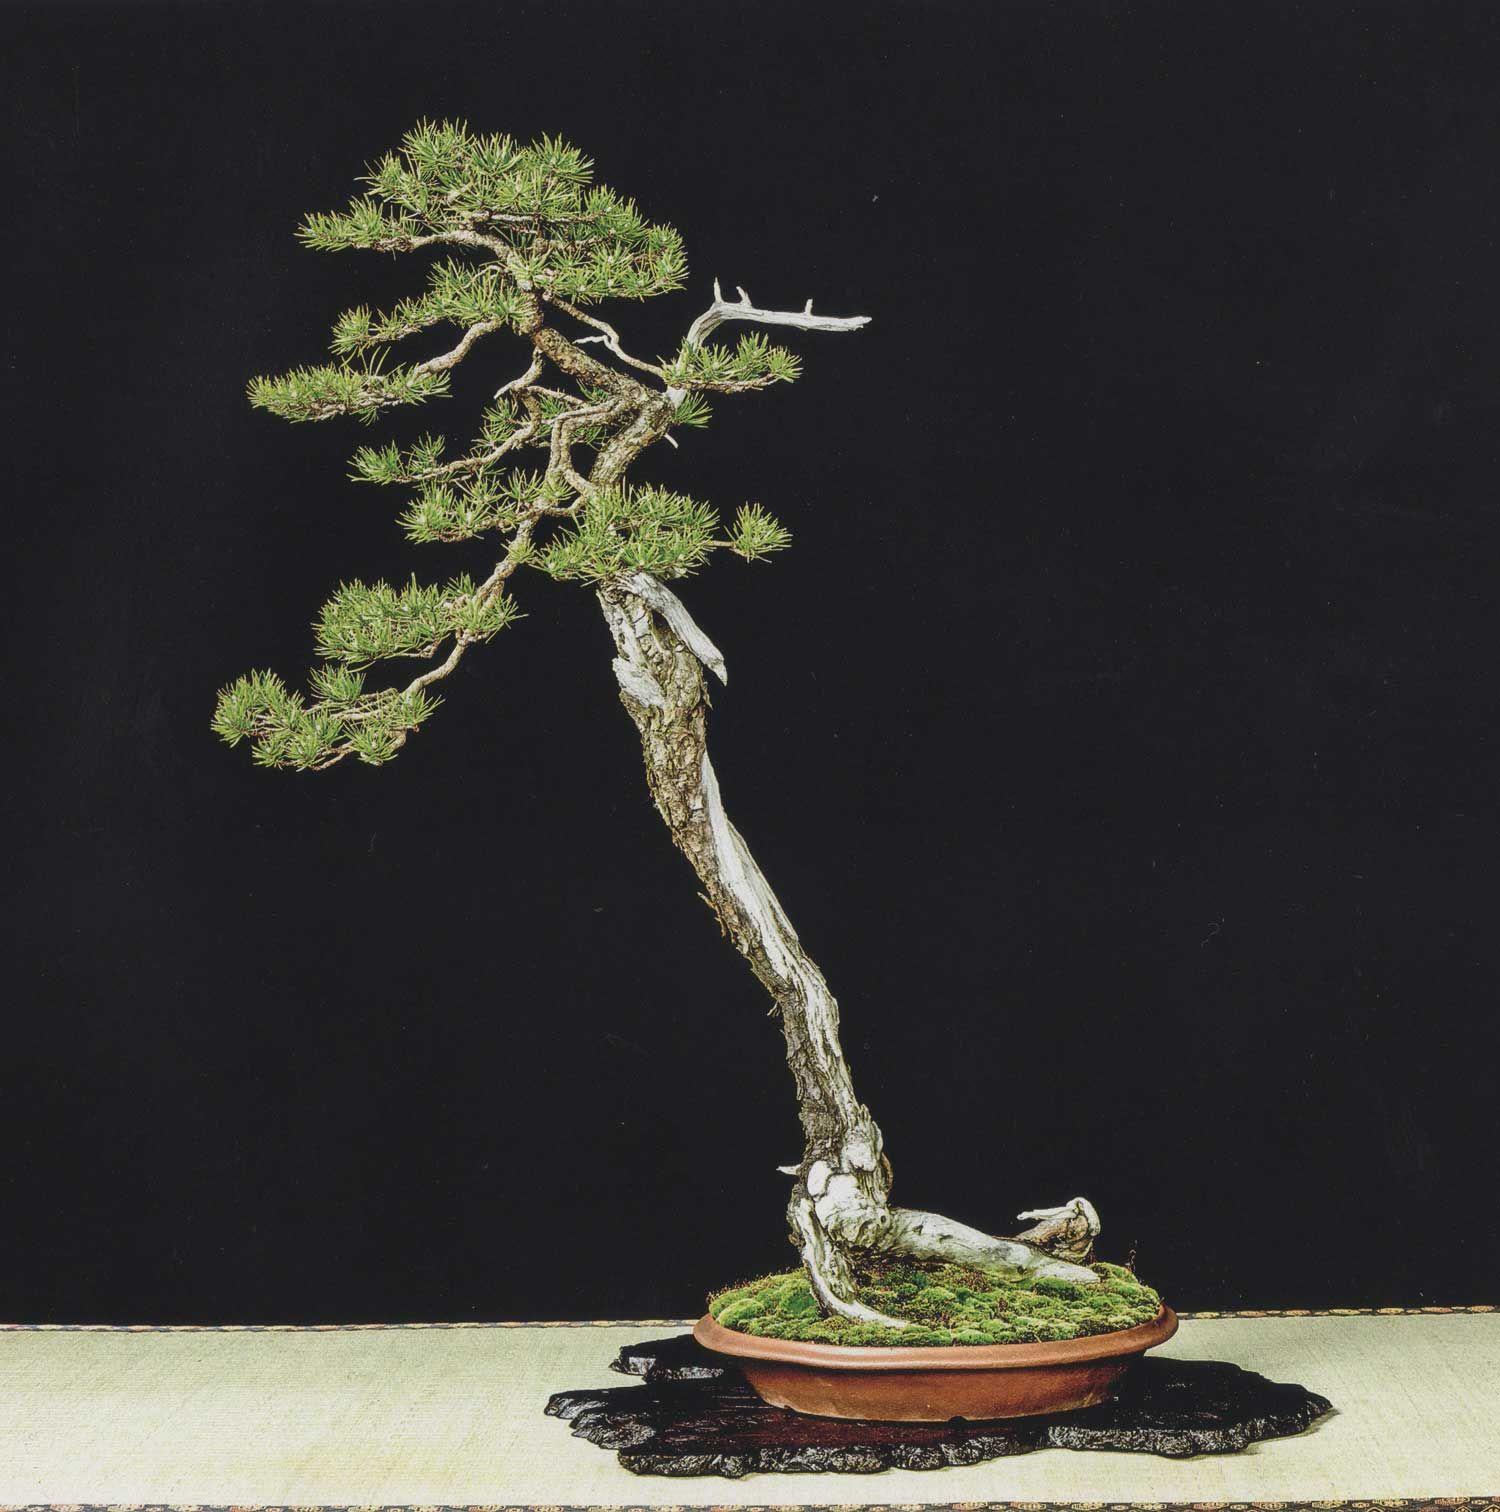 Pinus Banksiana By David J Of The Toronto Bonsai Society Perhaps The Finest Example Of A Jack Pine Bonsai And One Of My Persona Bonsai Art Pine Bonsai Bonsai